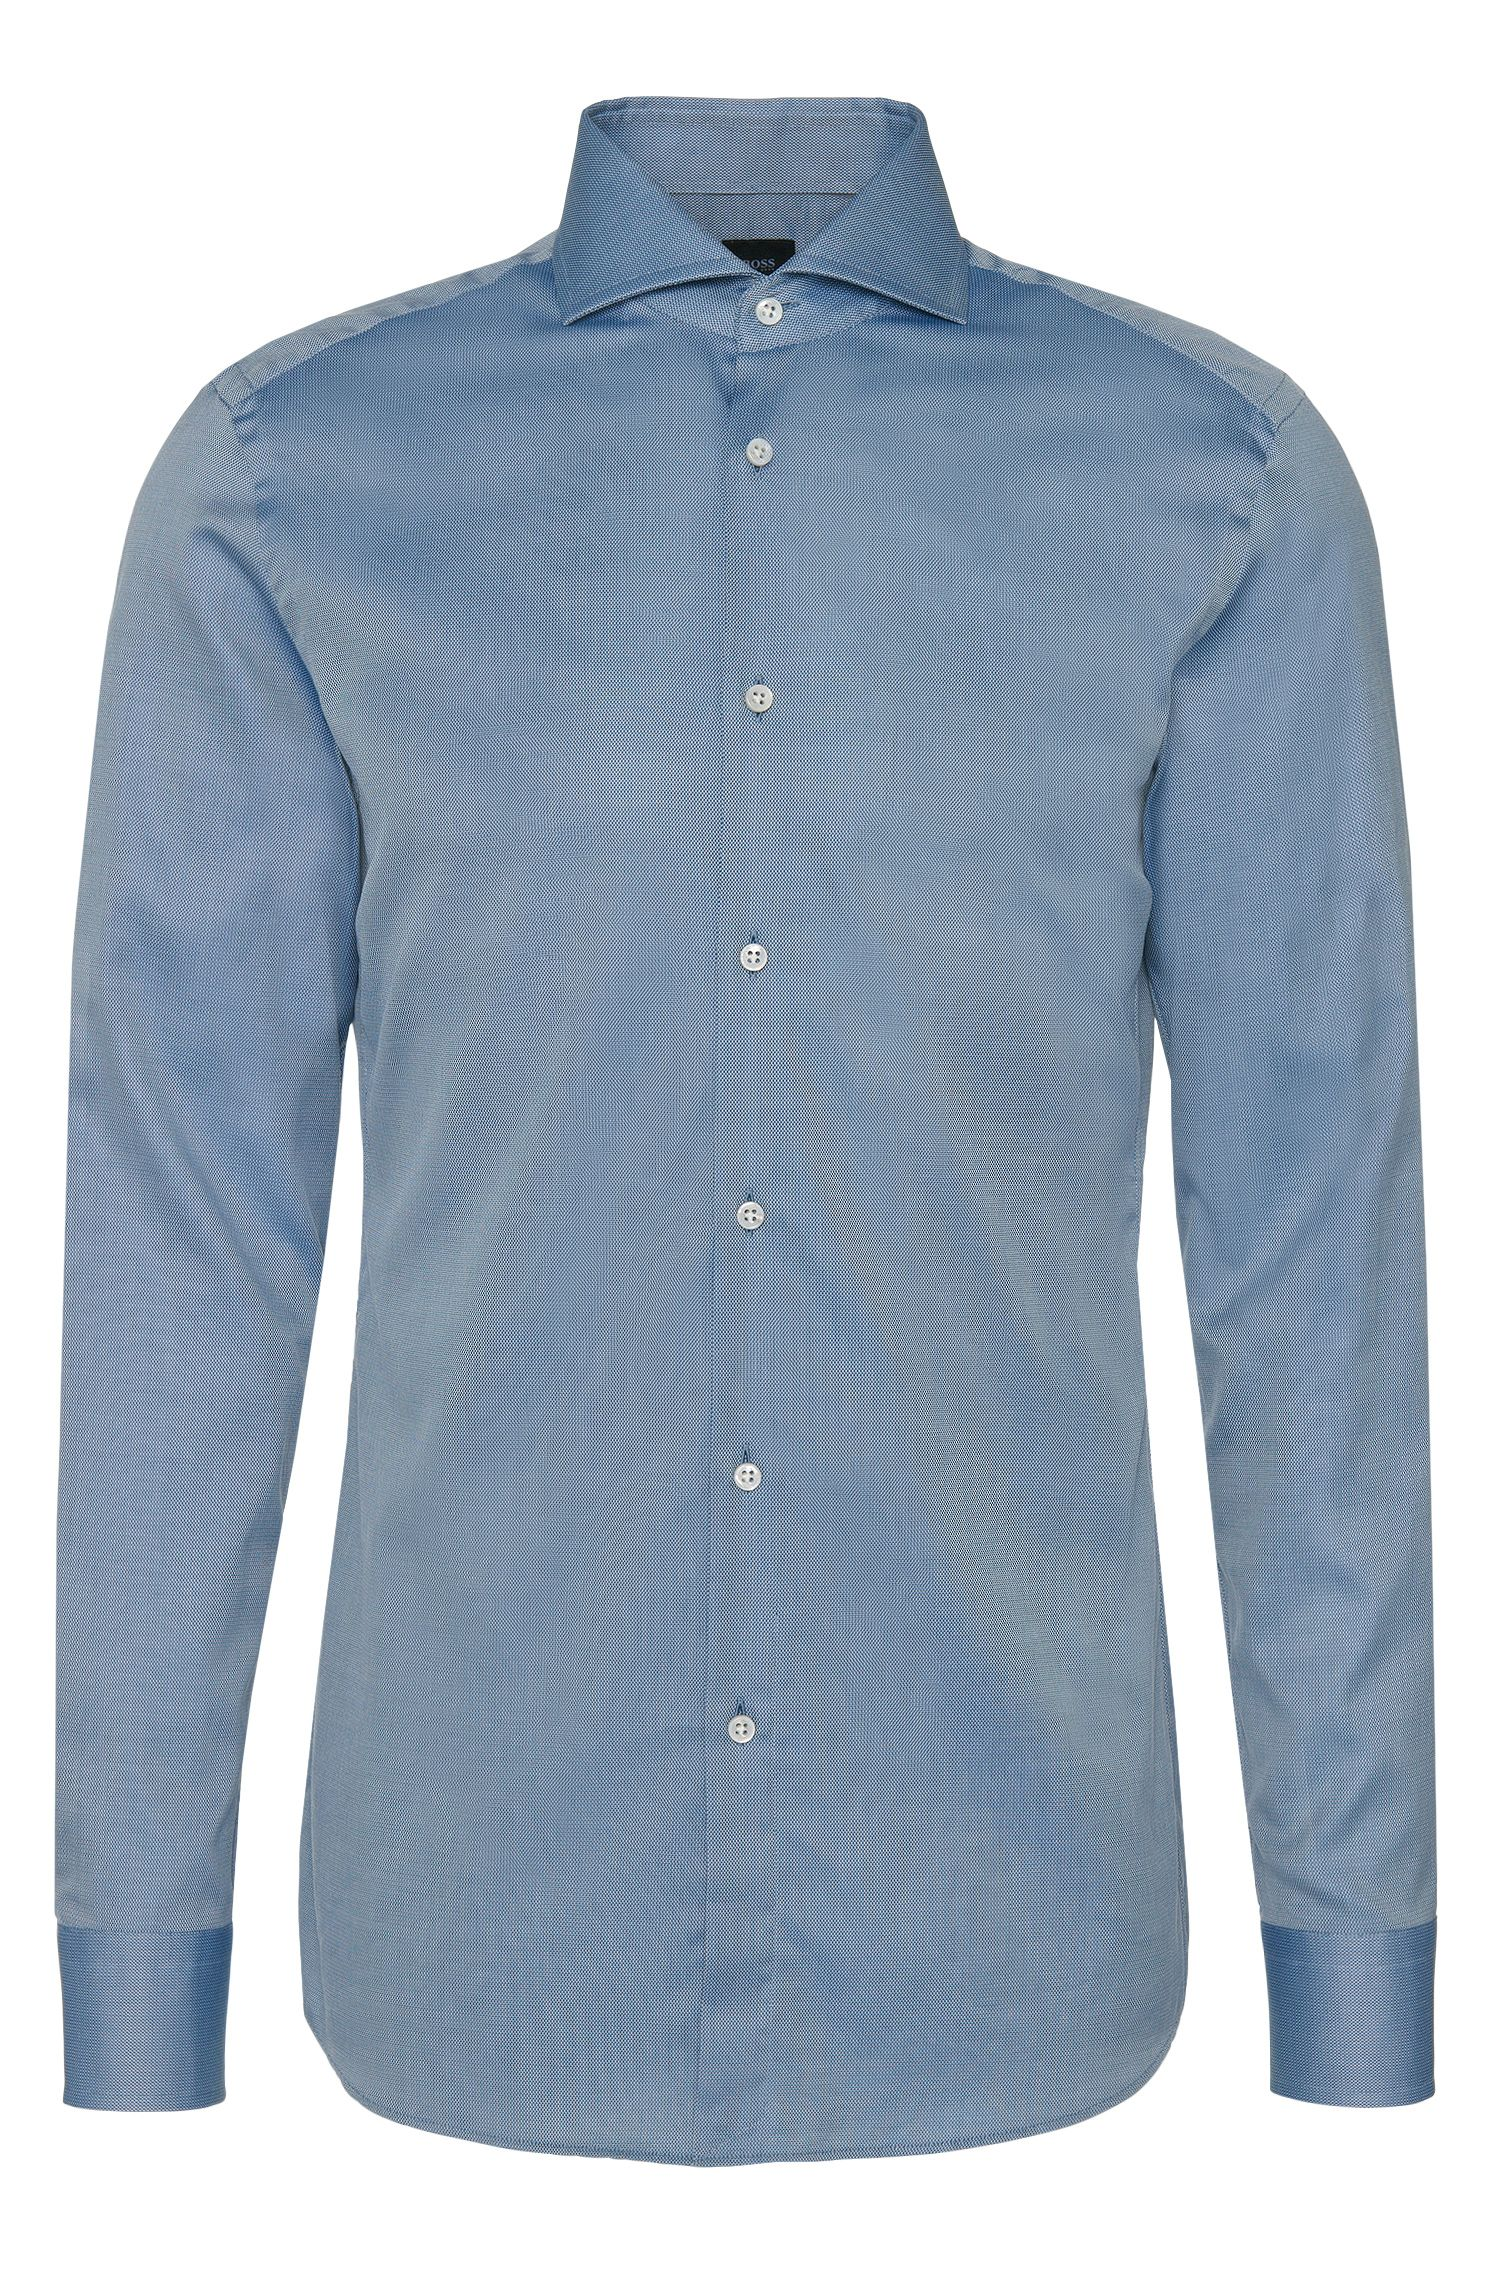 Fein gemustertes Slim-Fit Tailored Hemd aus Baumwolle: 'T-Christo'